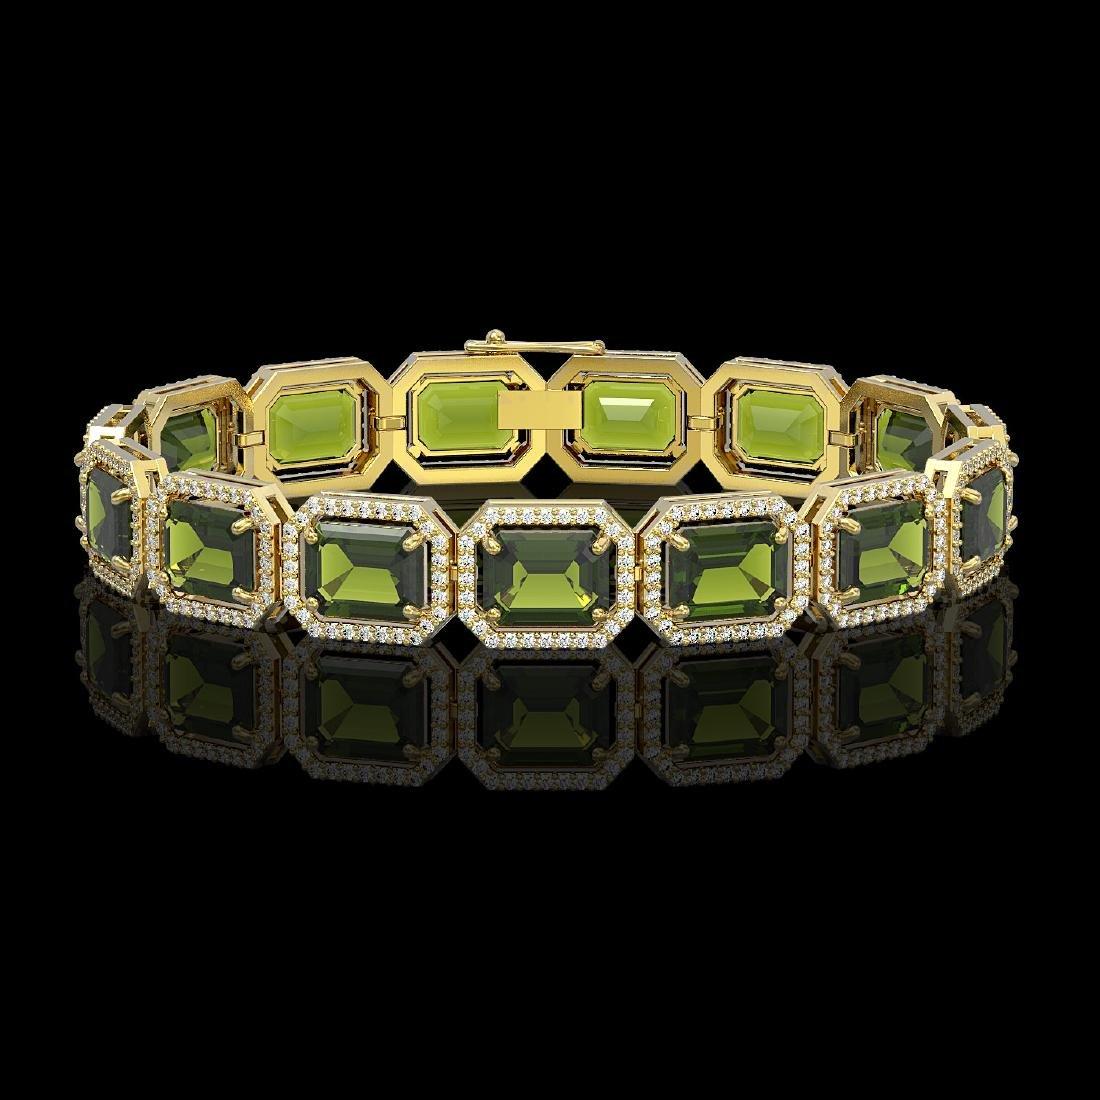 36.51 CTW Tourmaline & Diamond Halo Bracelet 10K Yellow